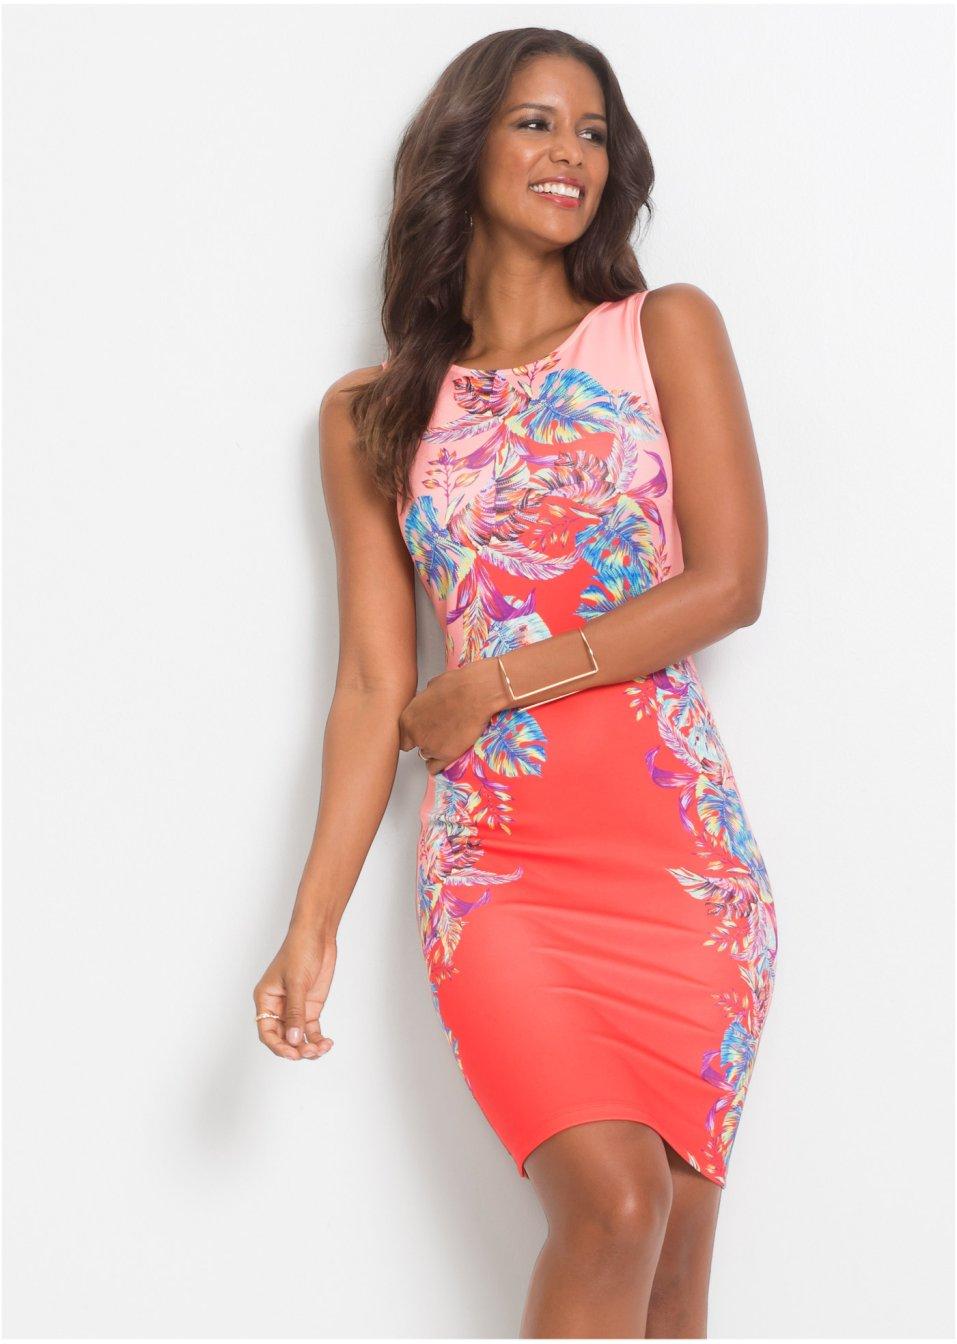 da21d9240ad66b Kleid mit floralem Print rot/pink/blau geblümt - Damen - BODYFLIRT boutique  - bonprix.de